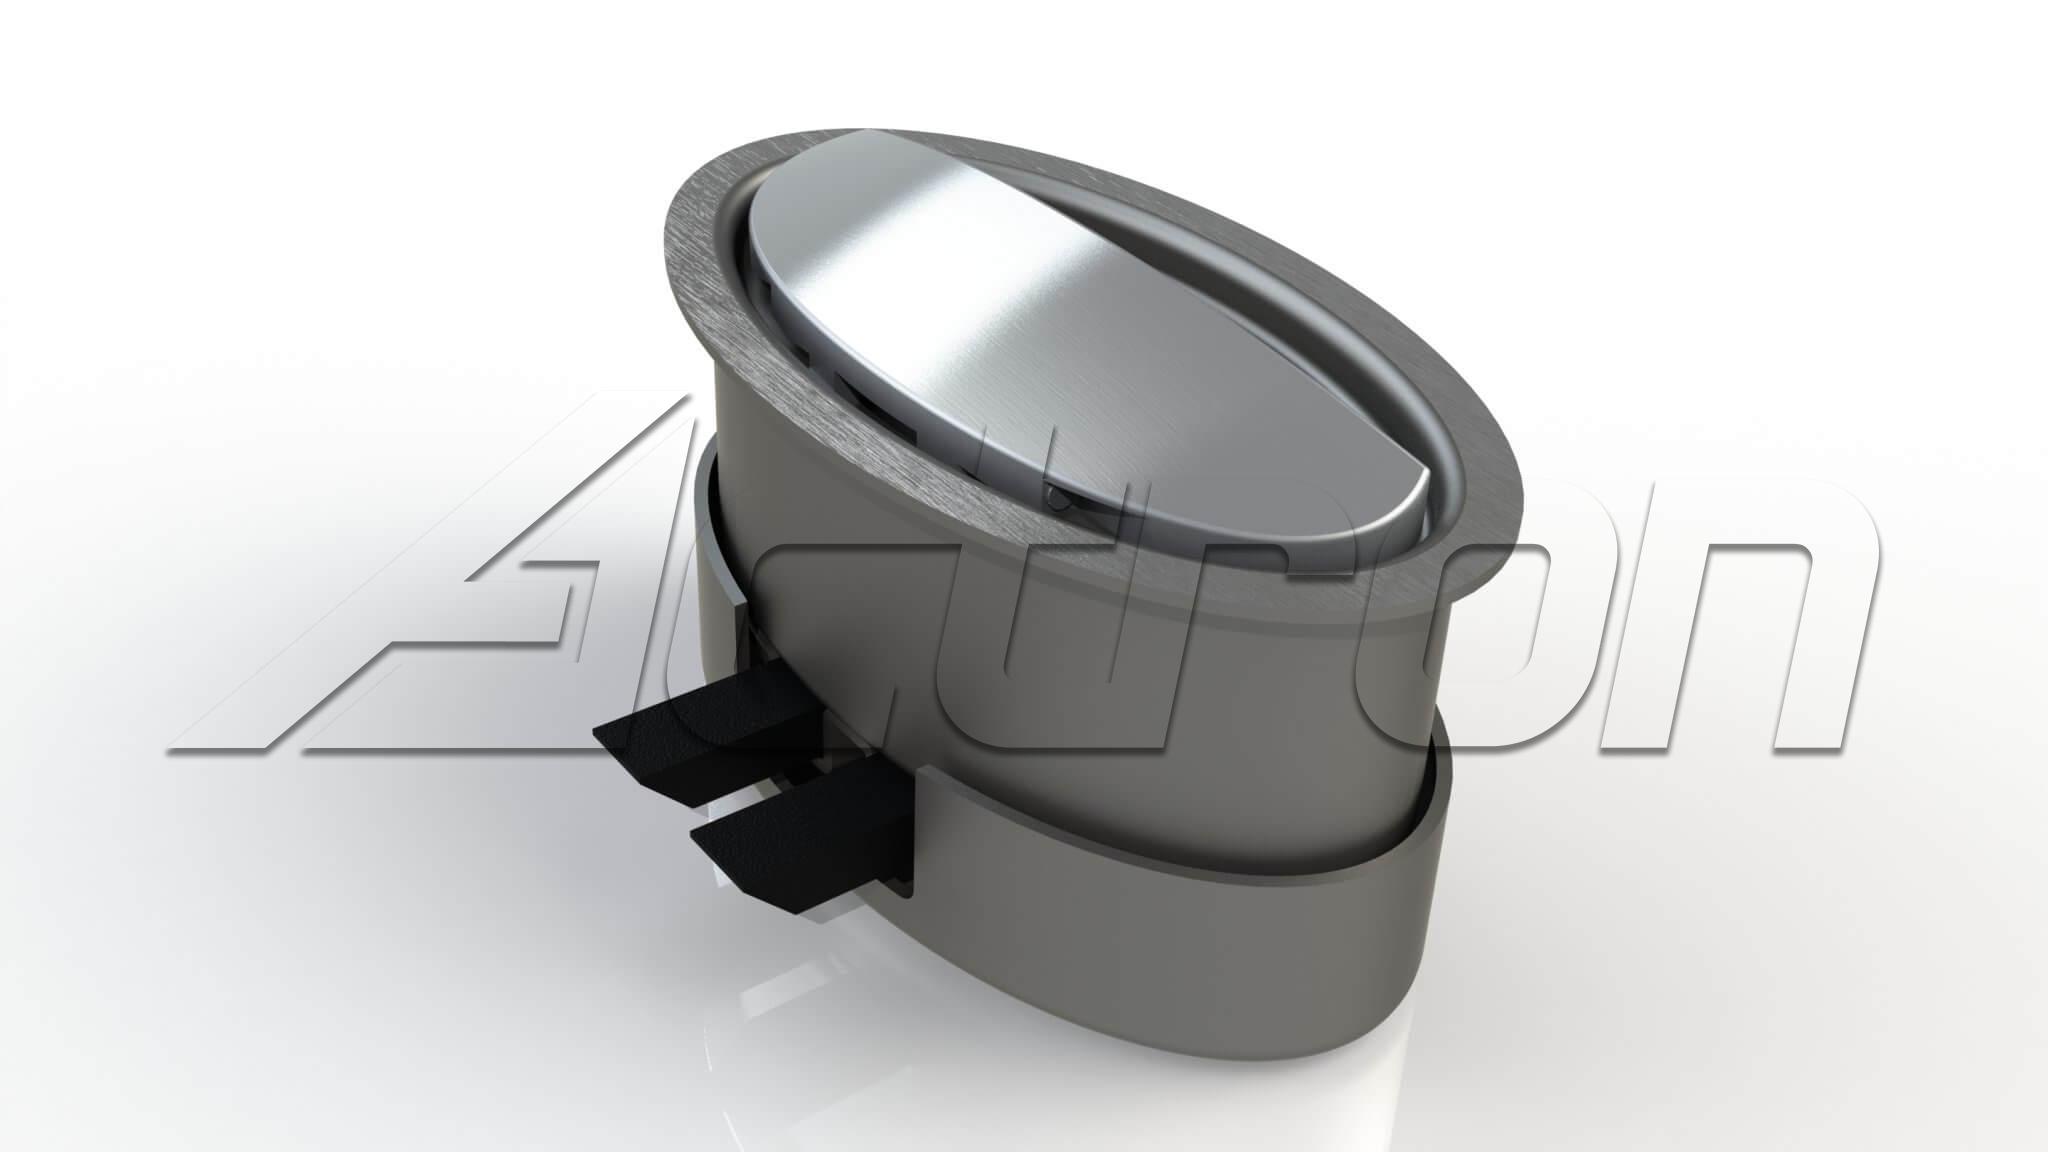 latch-assy-8211-double-bolt-5603-a23328.jpg